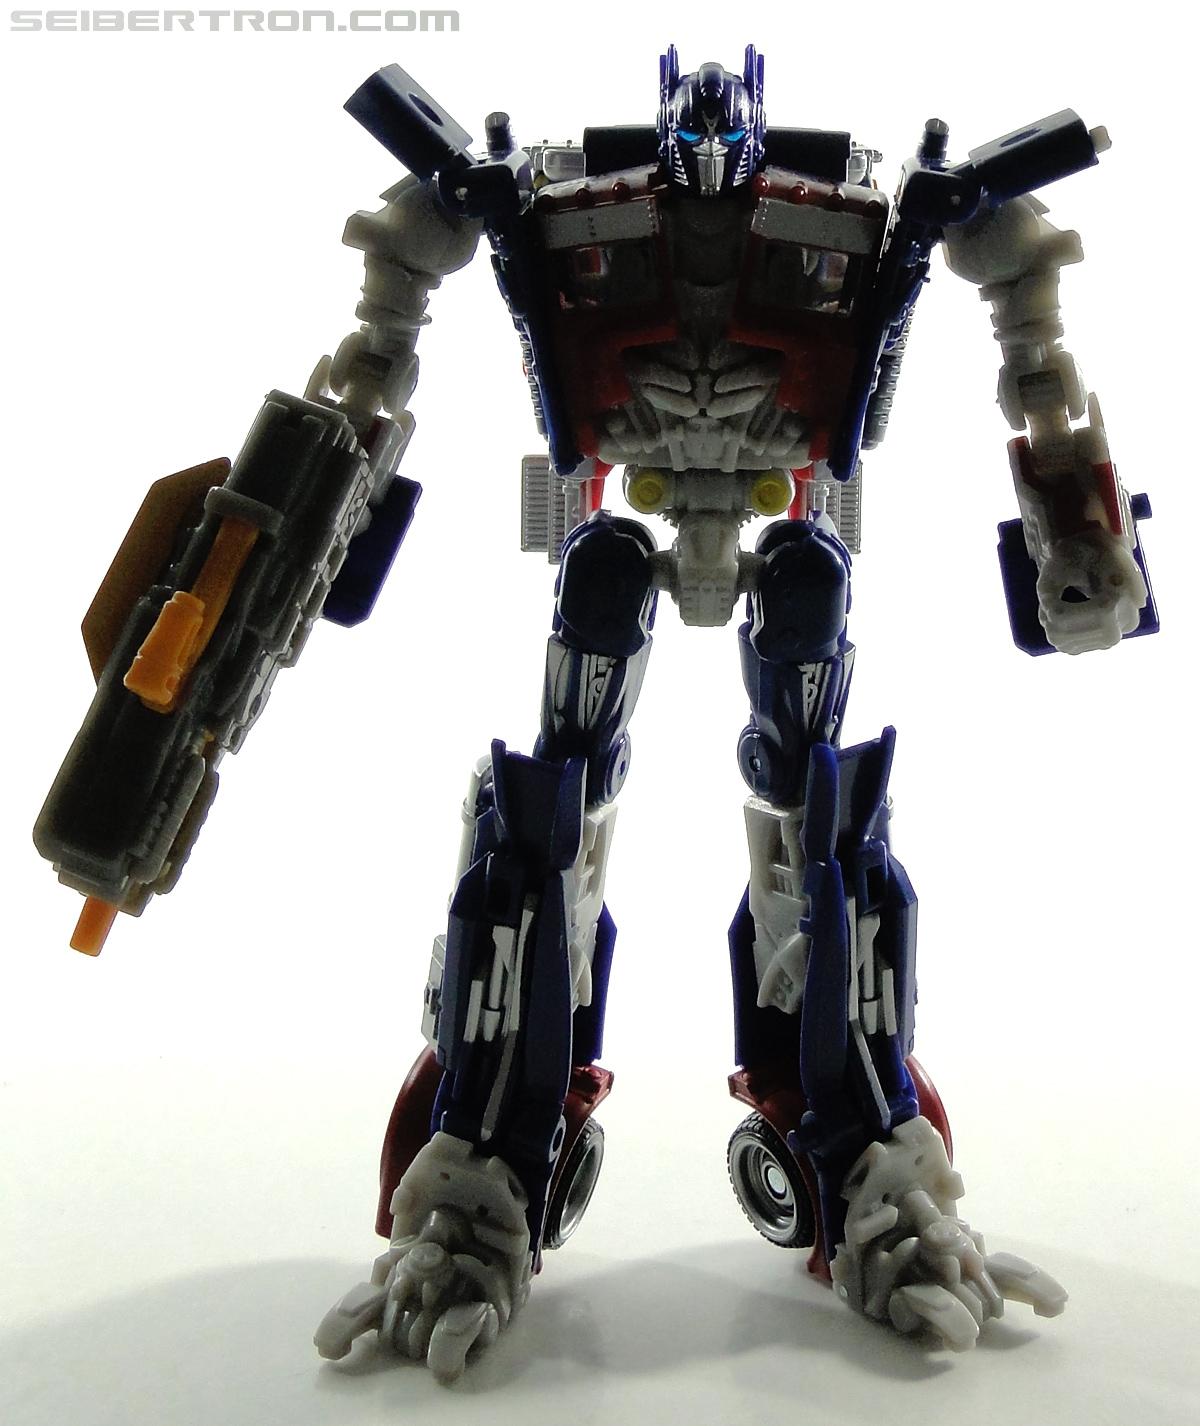 Transformers Dark of the Moon Optimus Prime (Image #120 of 145)